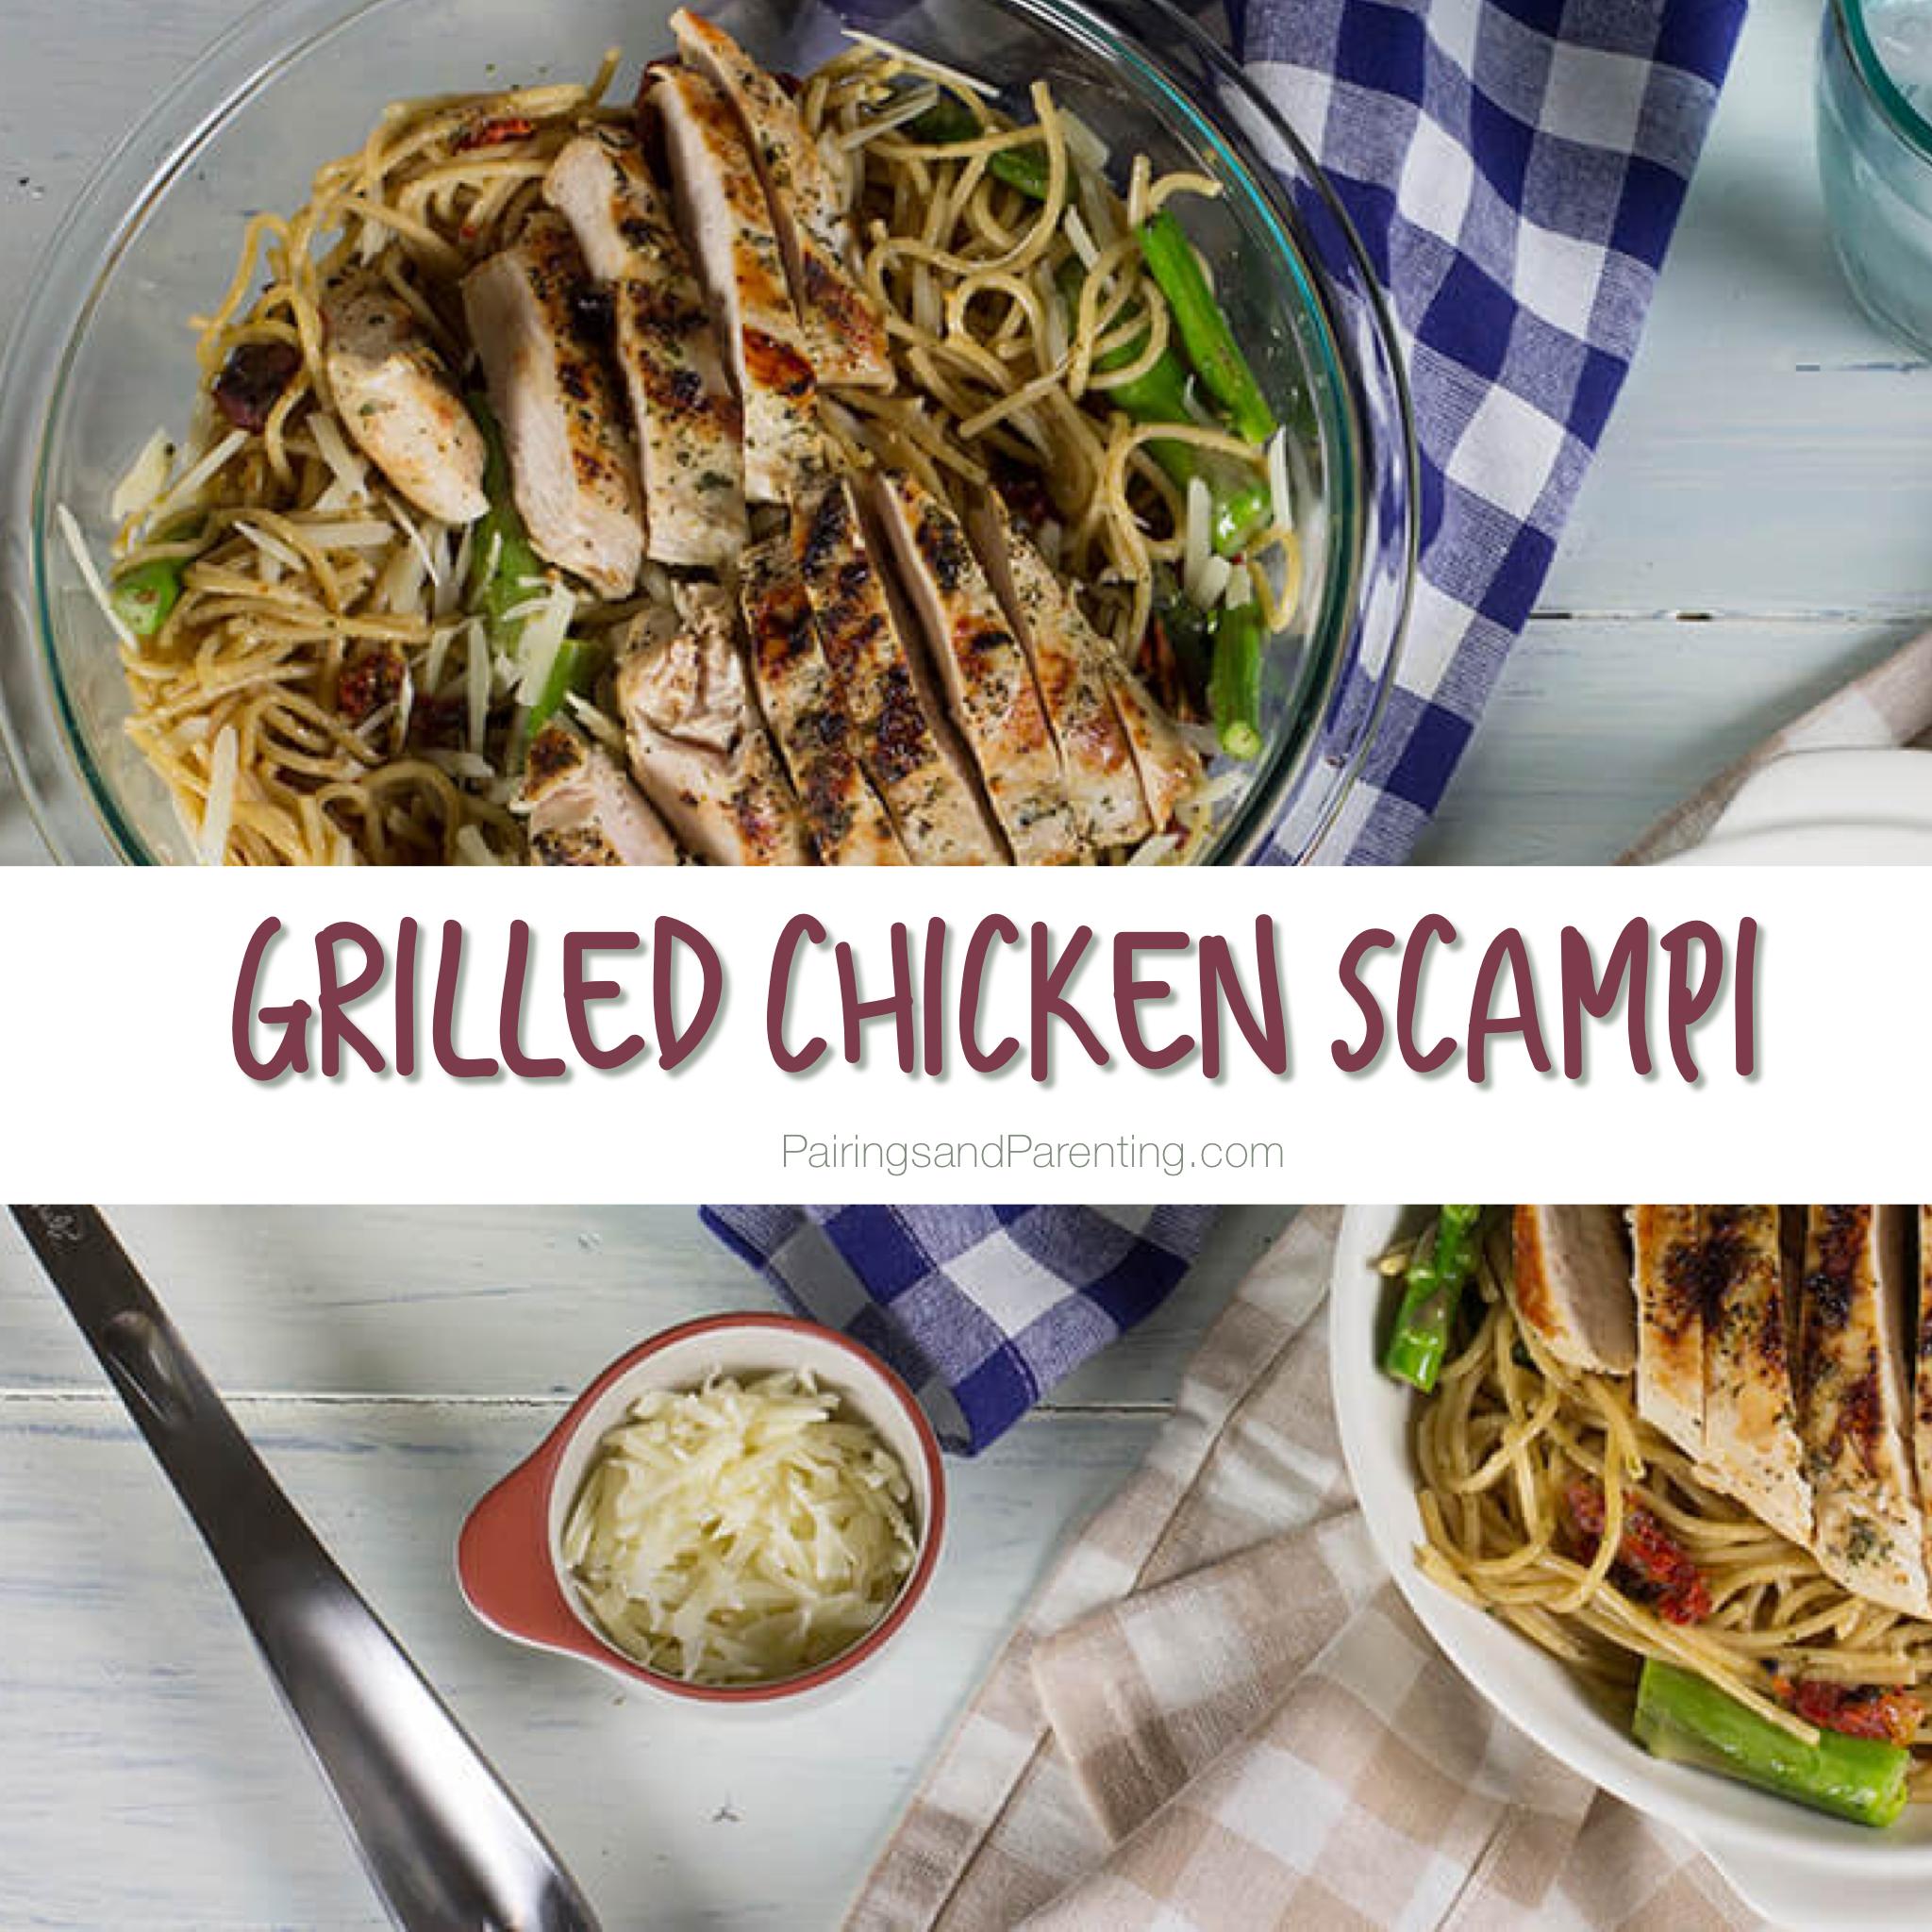 Grilled Chicken Scampi